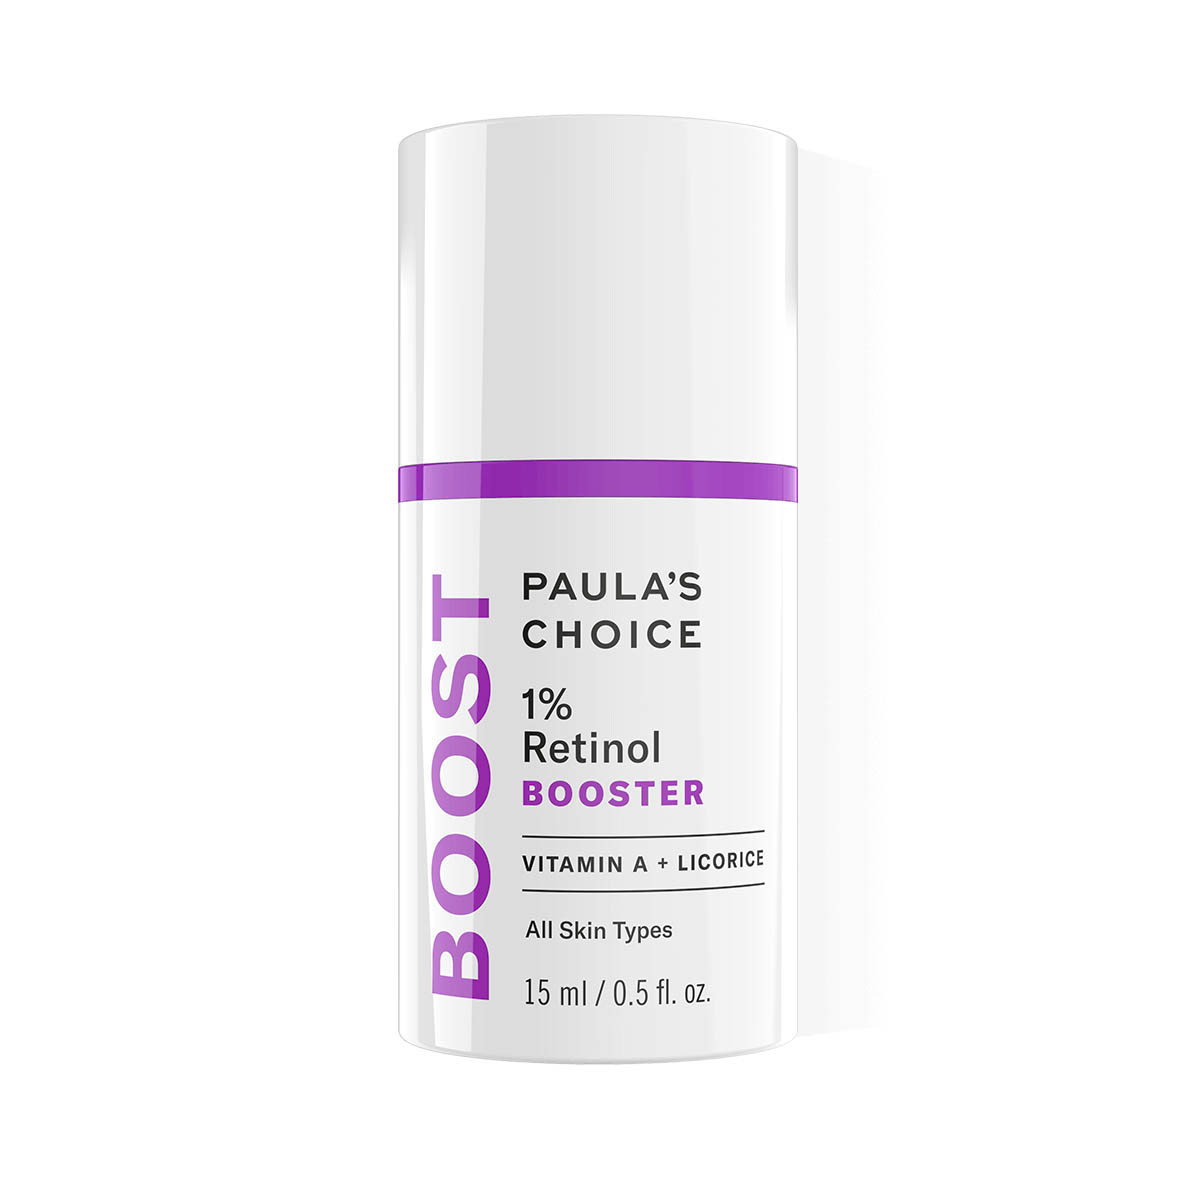 PAULA'S CHOICE 1% Retinol Booster Anti-Aging Serum Vitamin A Licorice